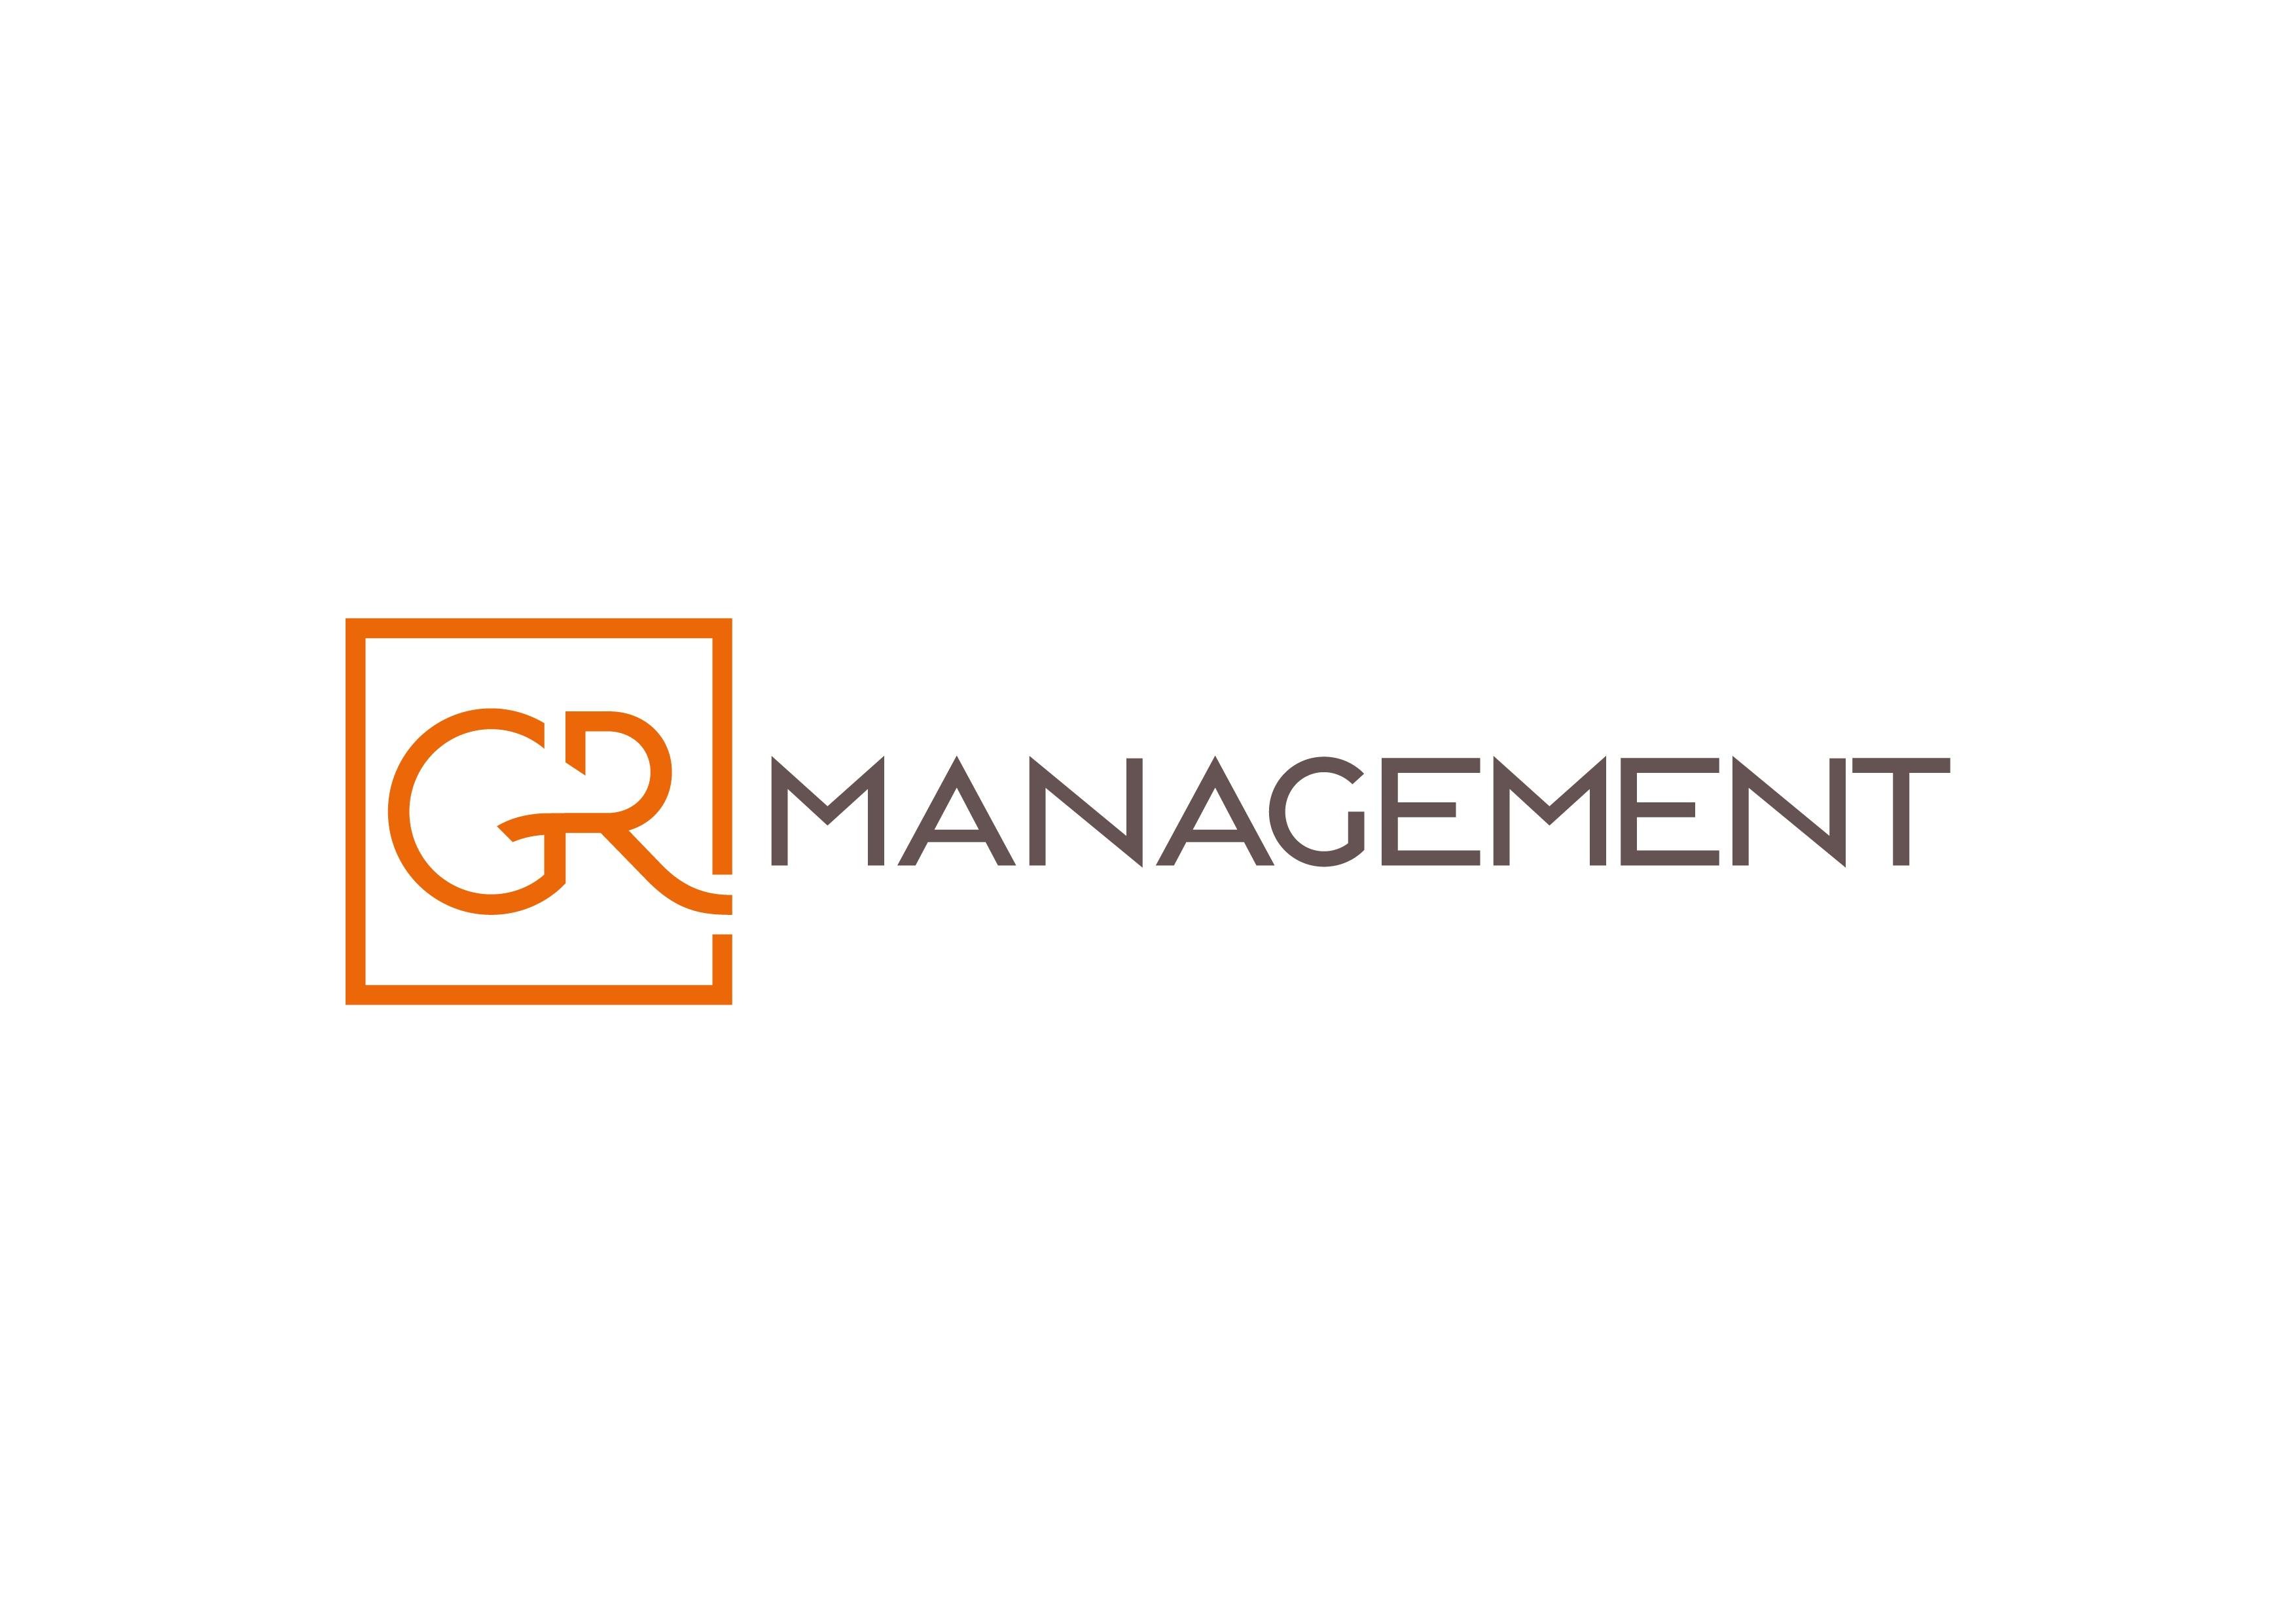 GR management